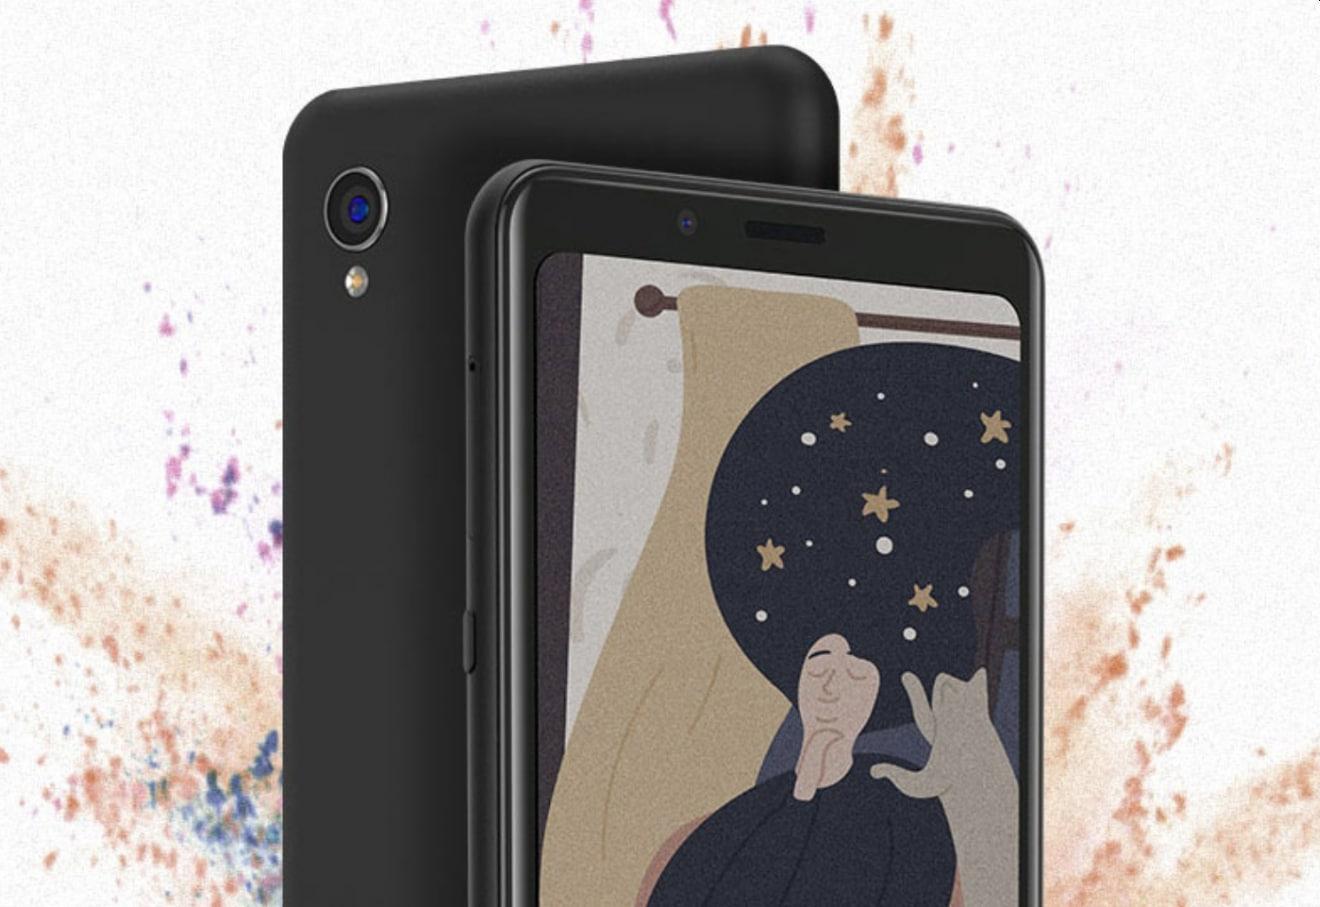 Hisense A5C is a color E INK smartphone